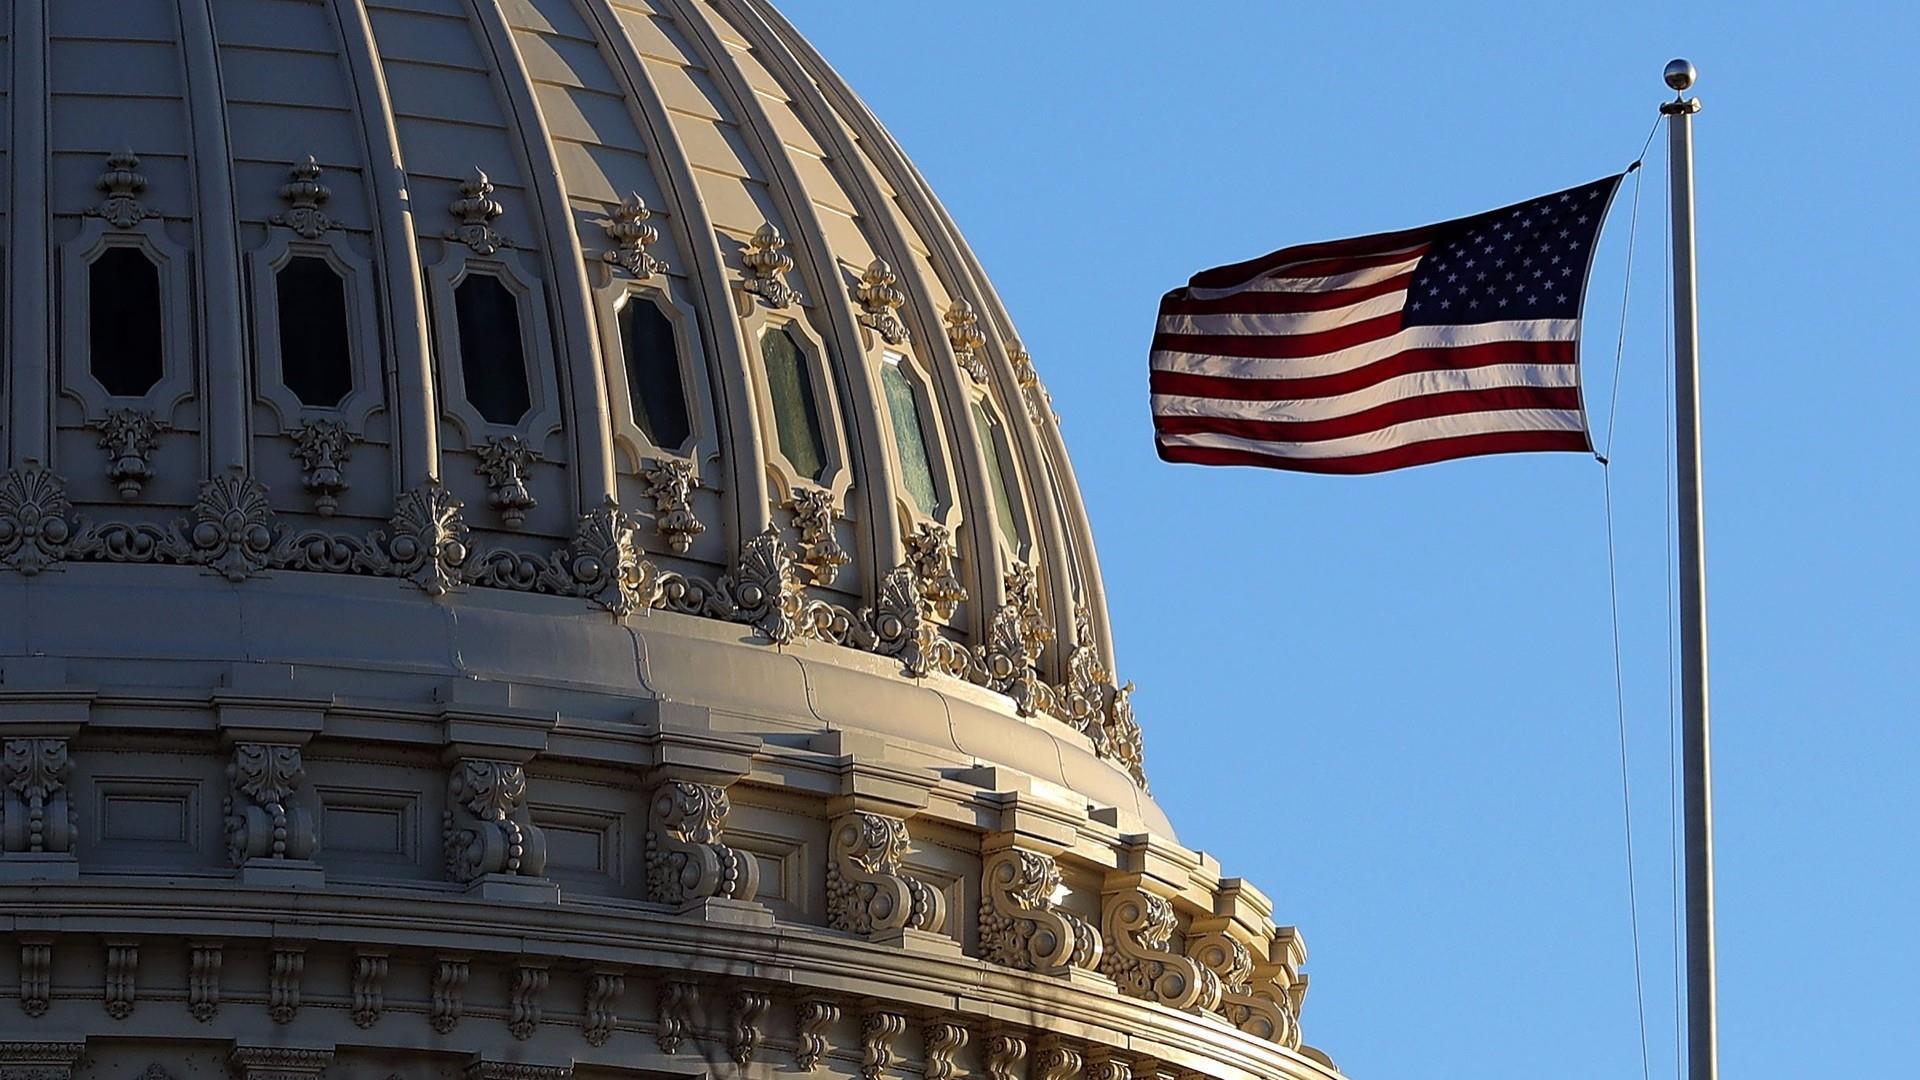 Congress facing calls for gun reform: Is it making progress?